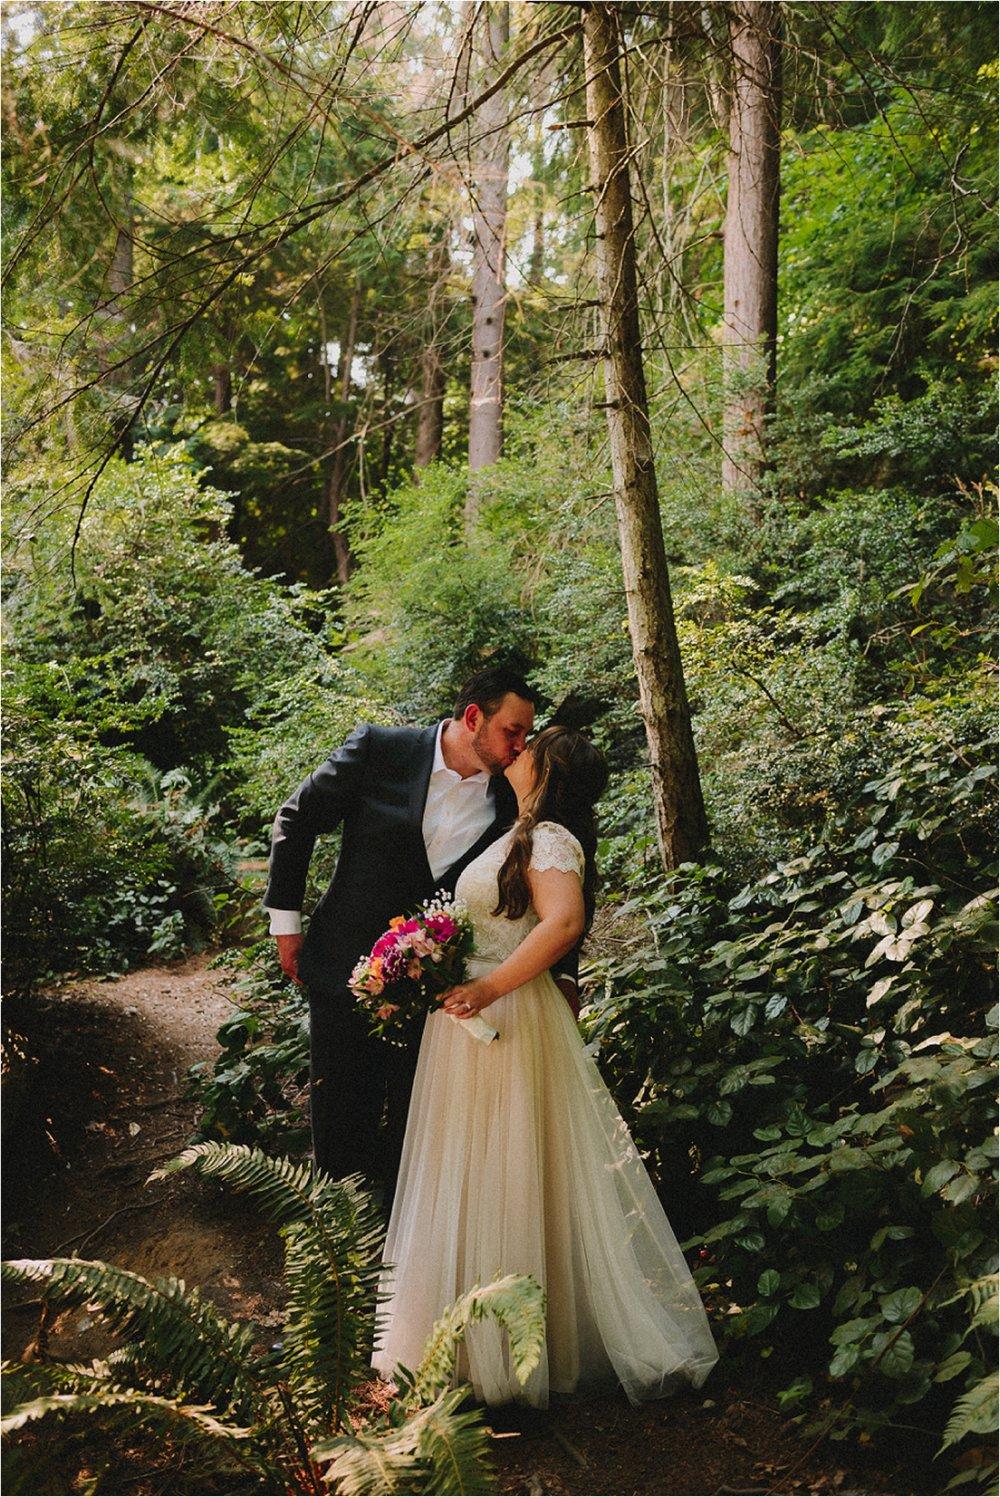 owen-beach-priest-point-park-tacoma-washington-elopement-jannicka-mayte-anchorage-alaska-wedding-elopement-photographer (27).jpg